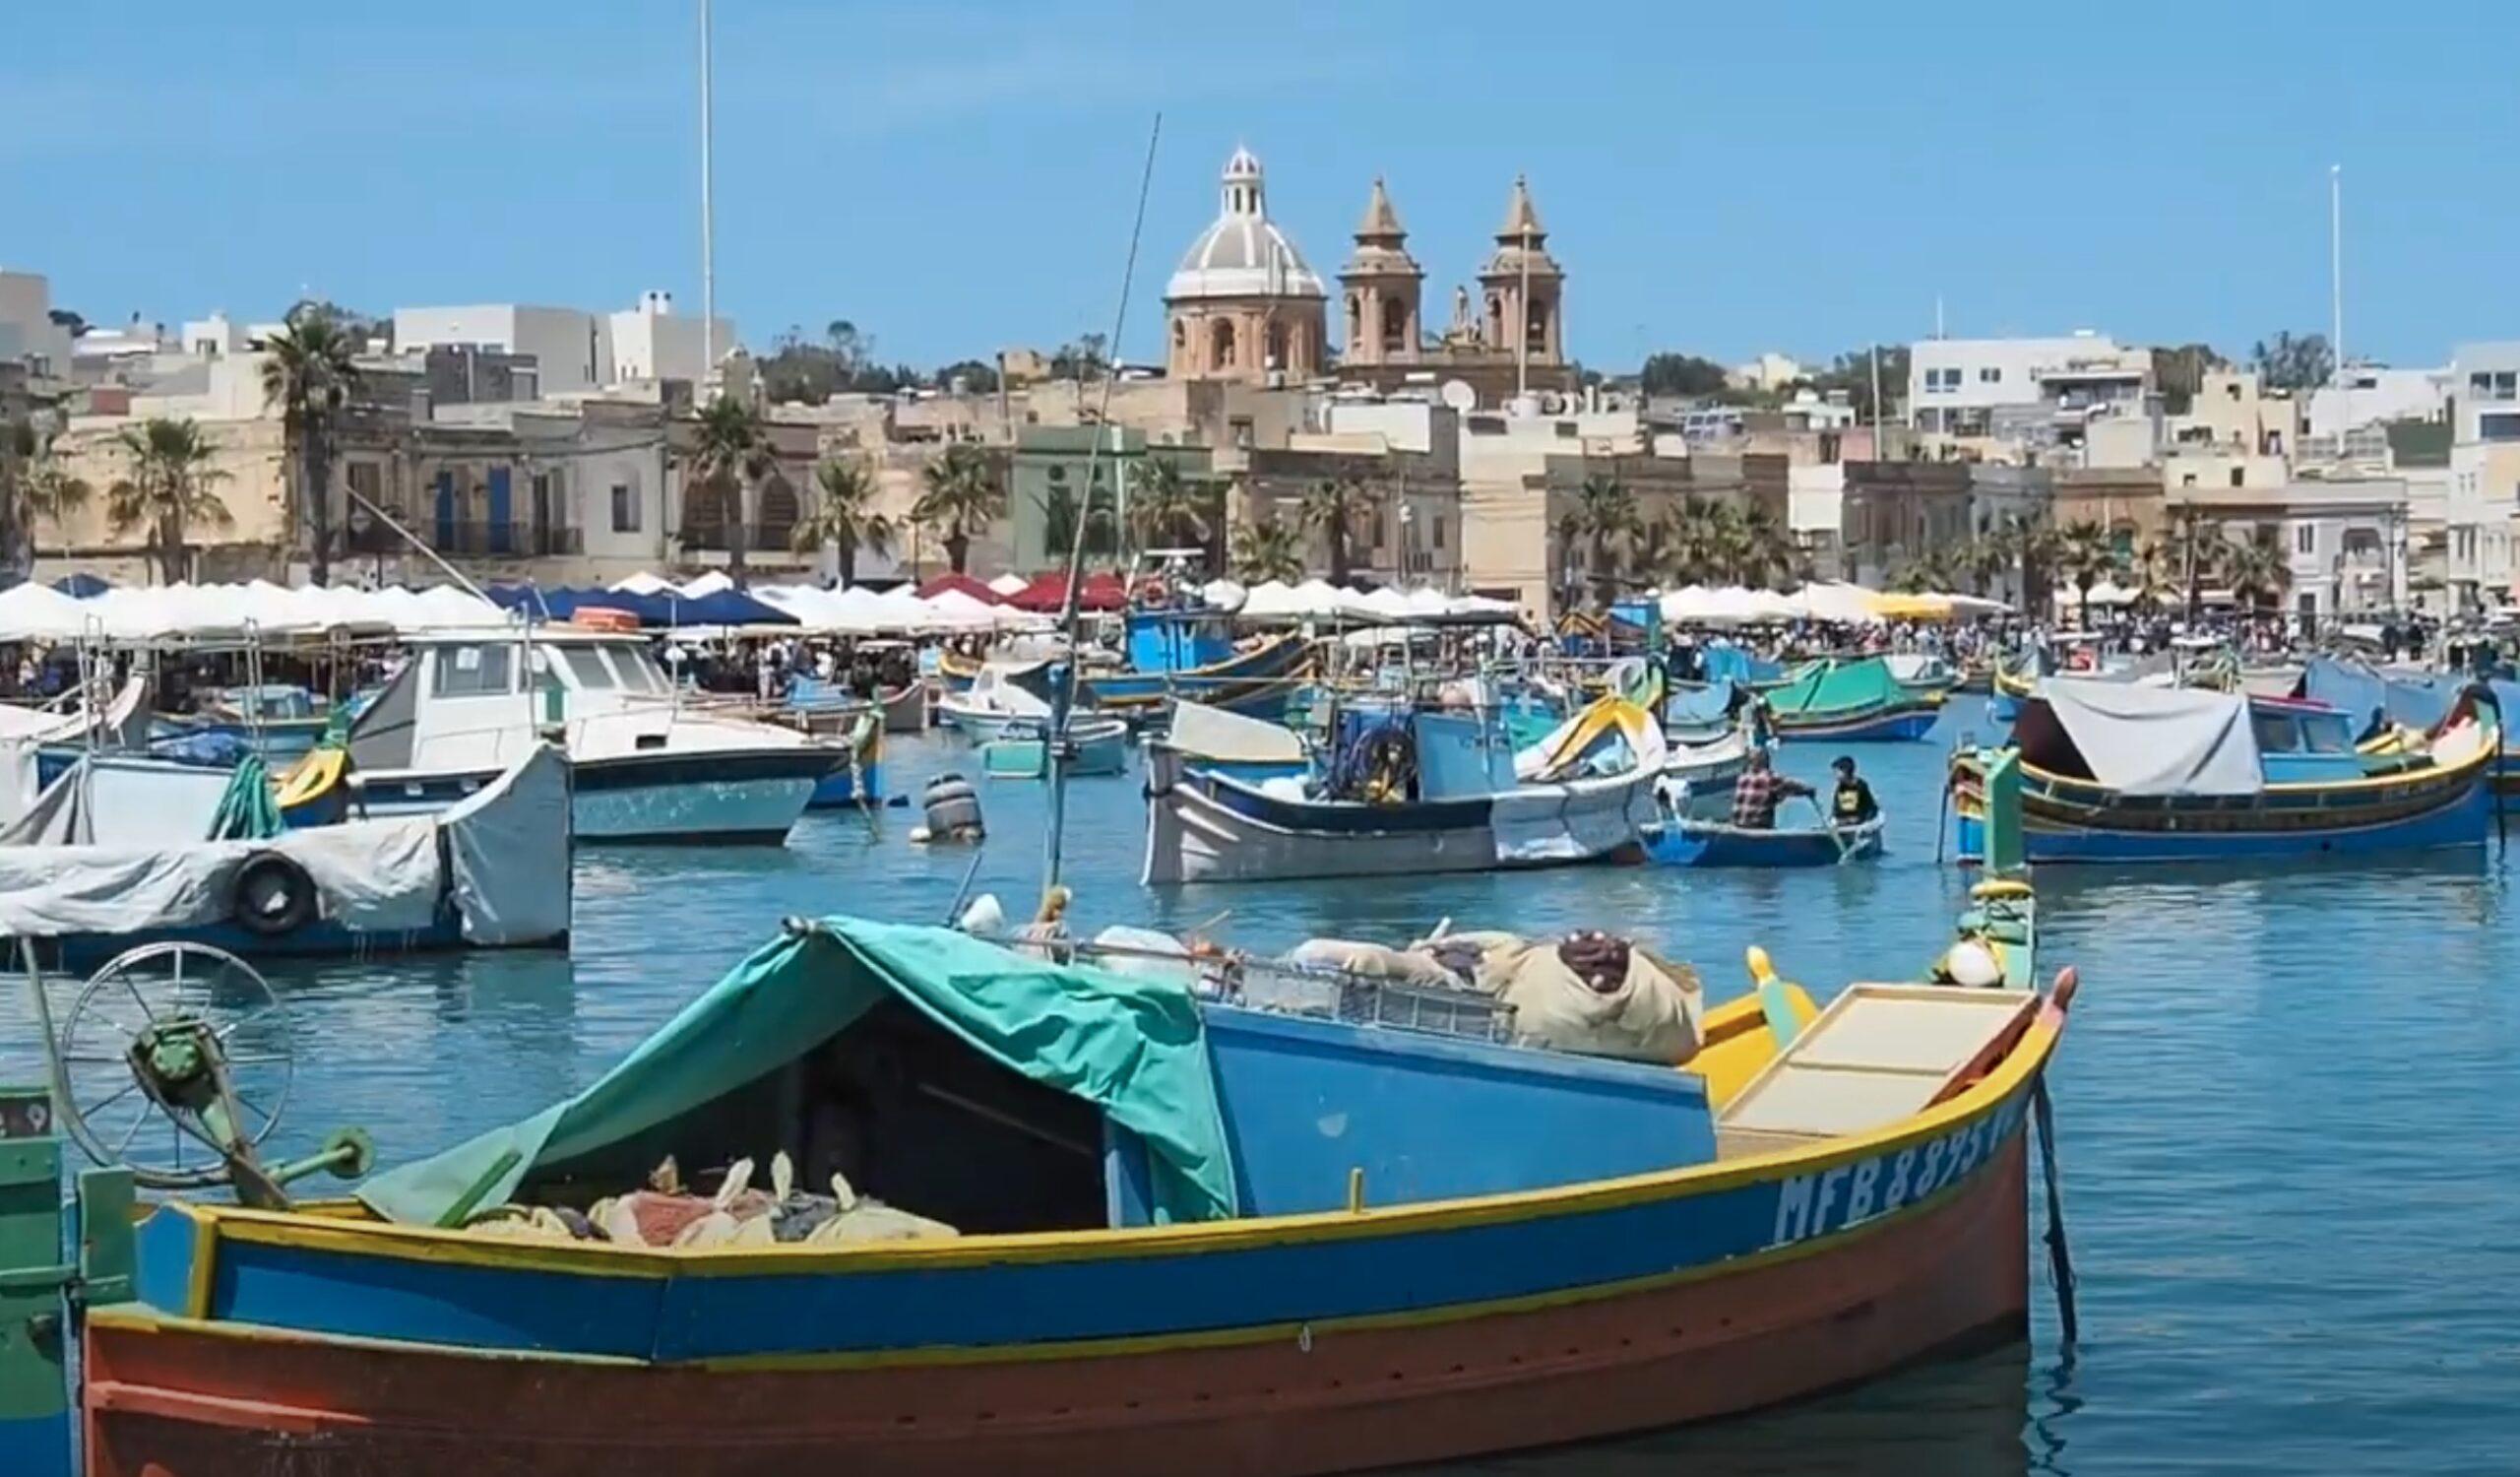 Un paseo por la isla de Malta